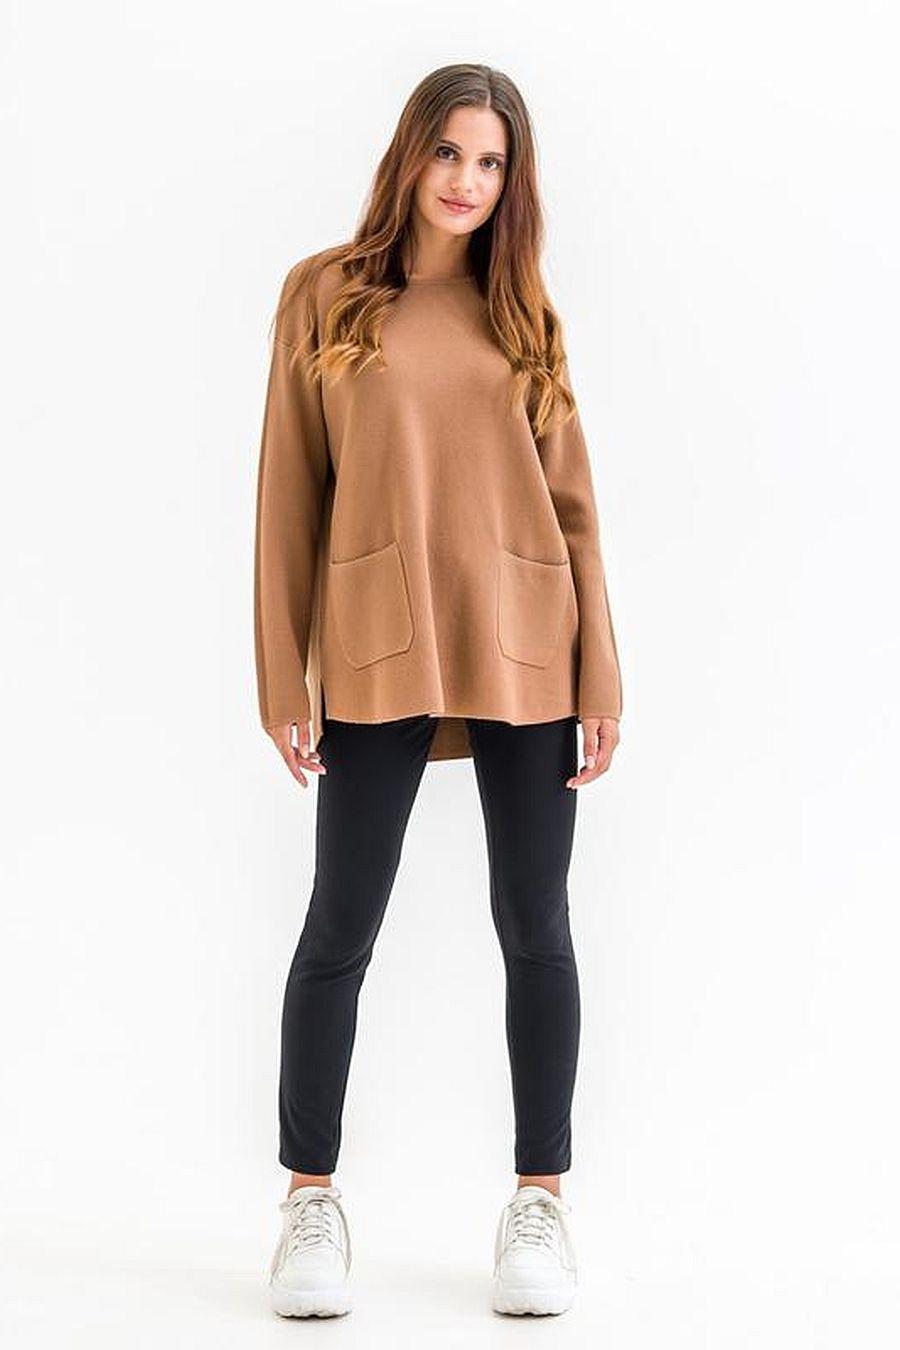 Reclaim Superpower Pockets Sweater - Camel